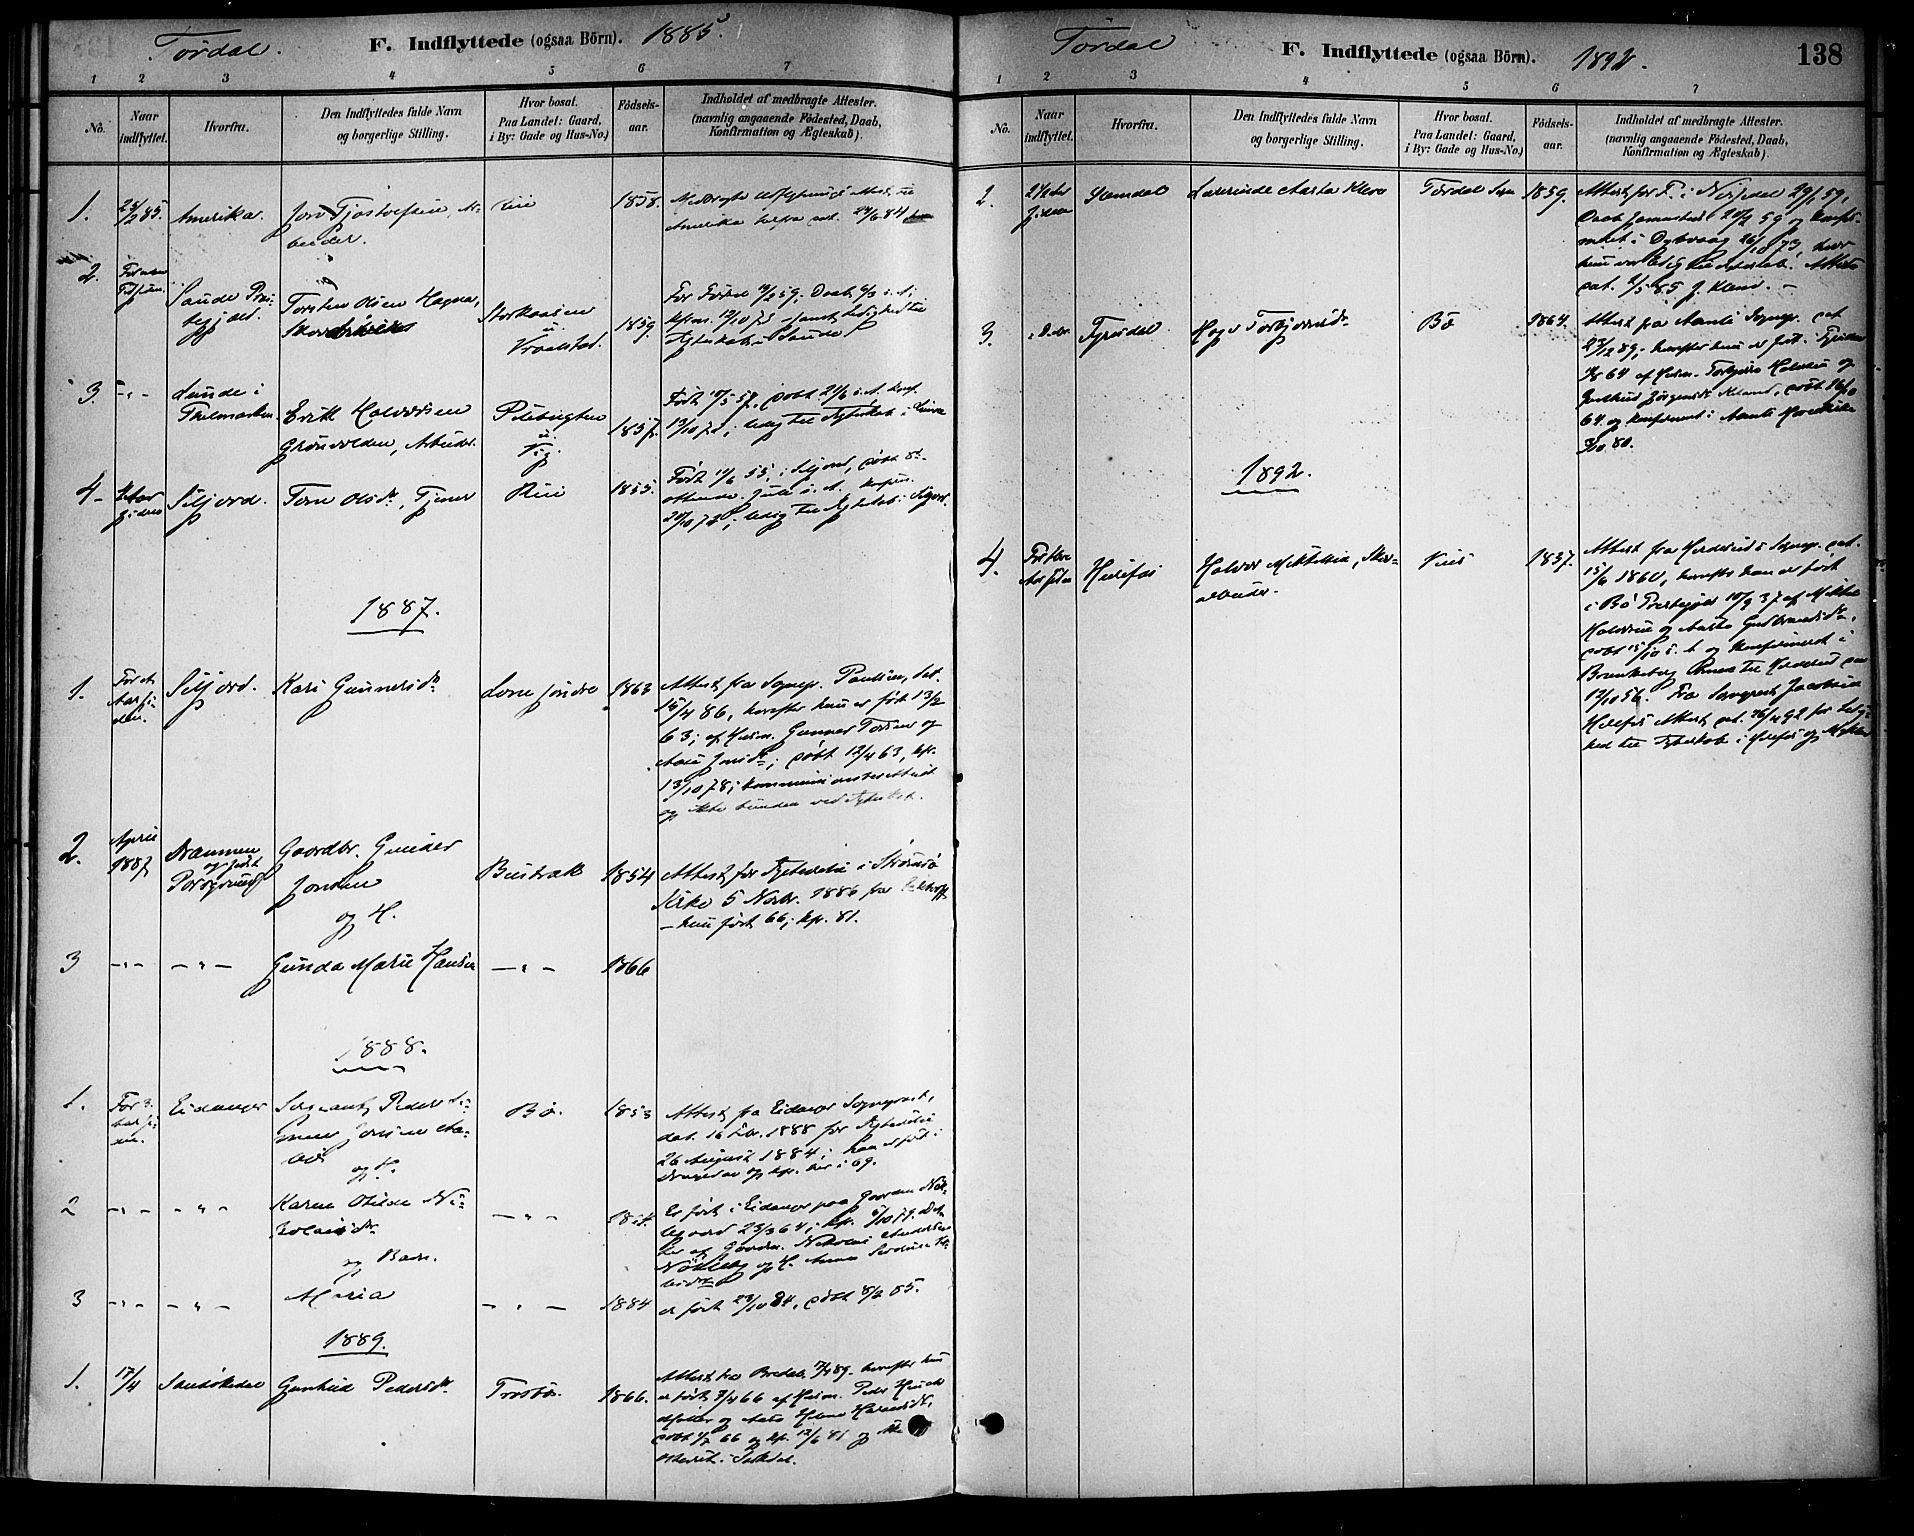 SAKO, Drangedal kirkebøker, F/Fa/L0011: Ministerialbok nr. 11 /2, 1885-1894, s. 138